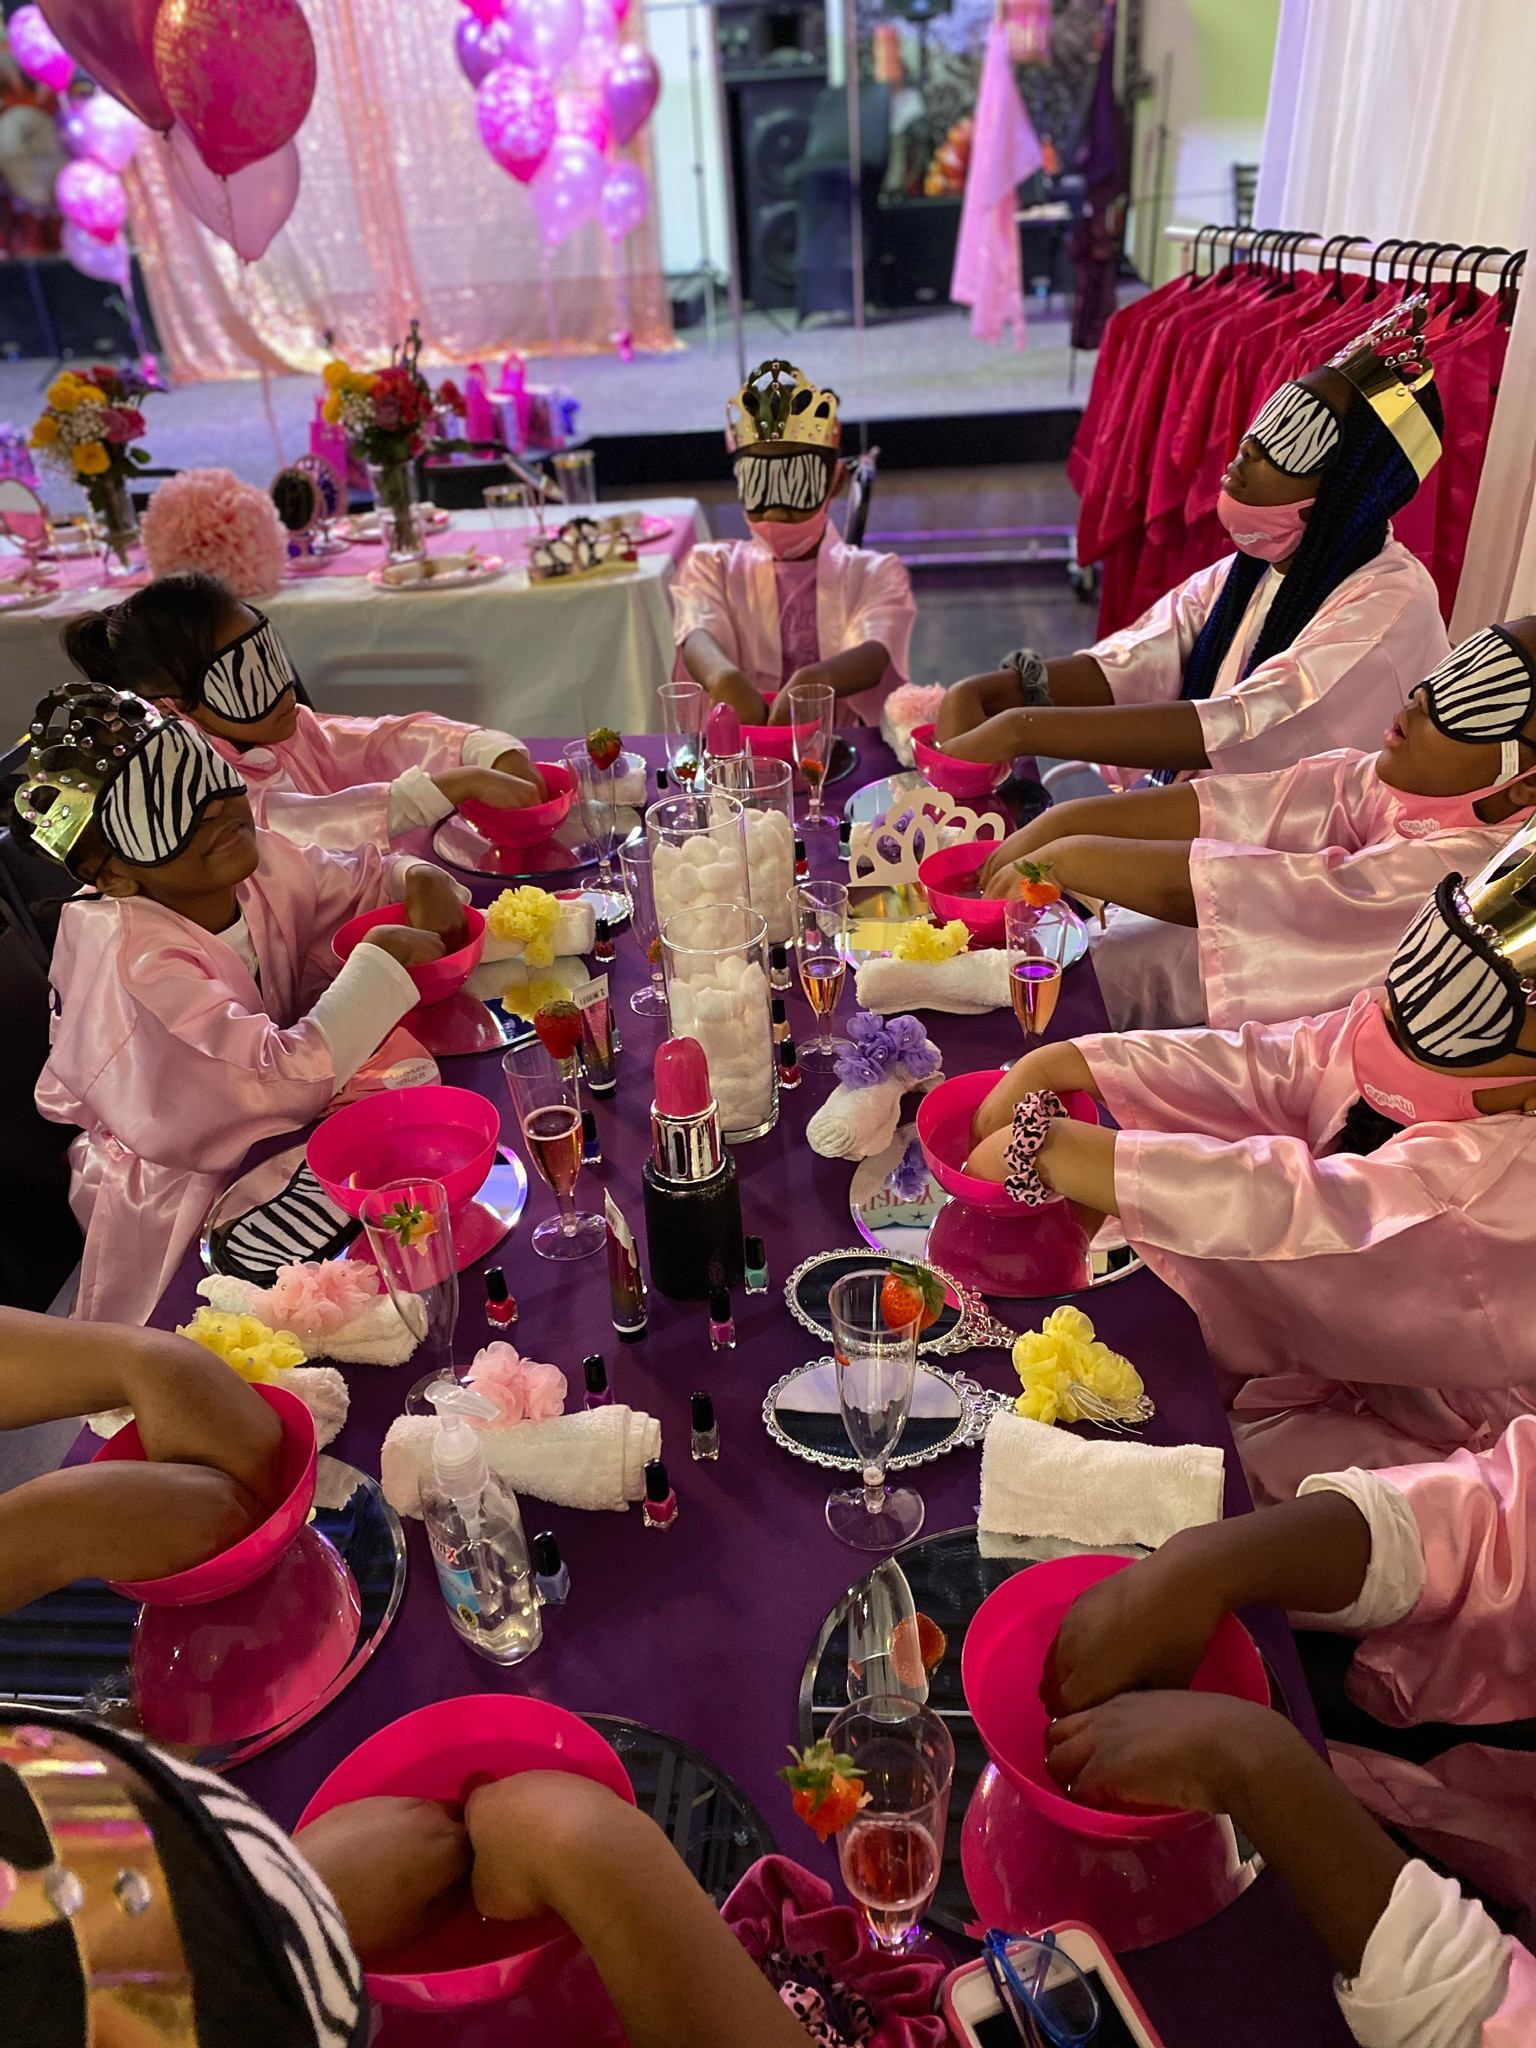 VIP Pretty Girls Spa Party